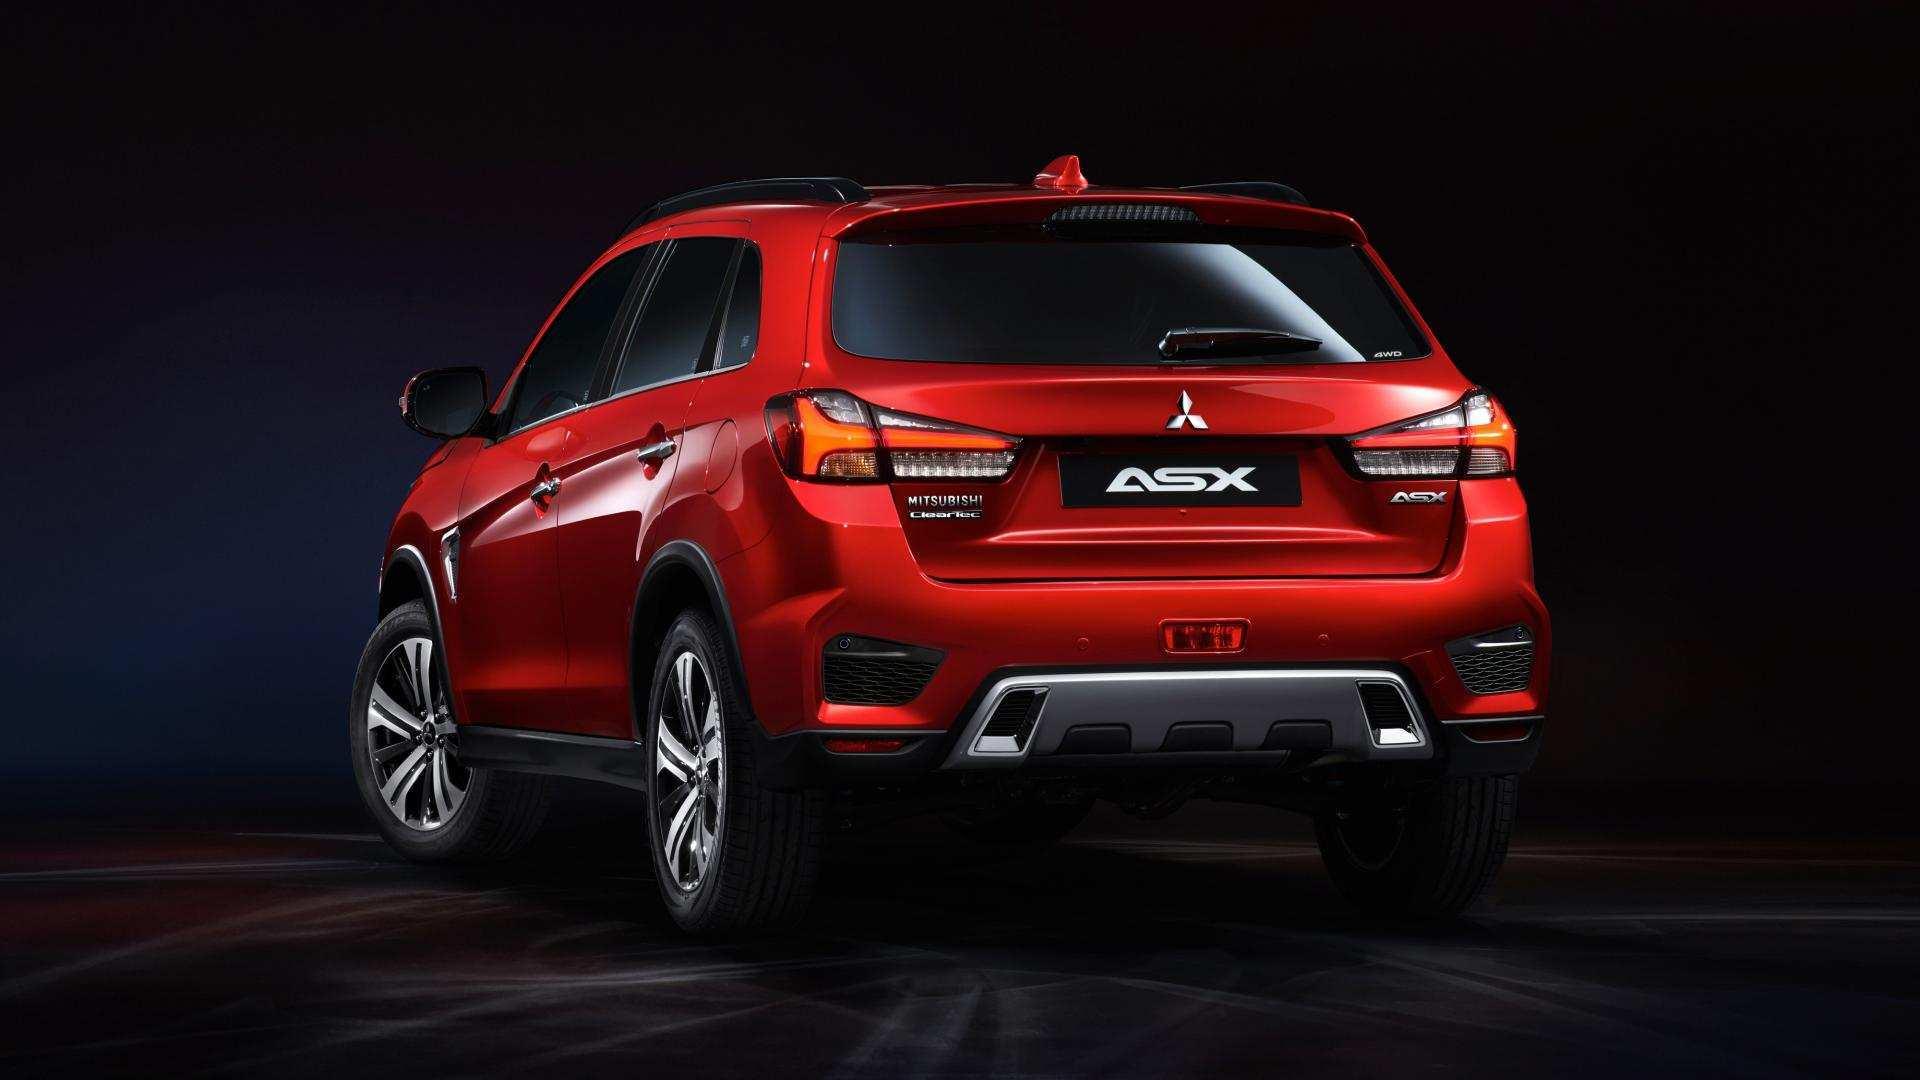 42 Concept of Mitsubishi Asx 2020 Uscita History for Mitsubishi Asx 2020 Uscita